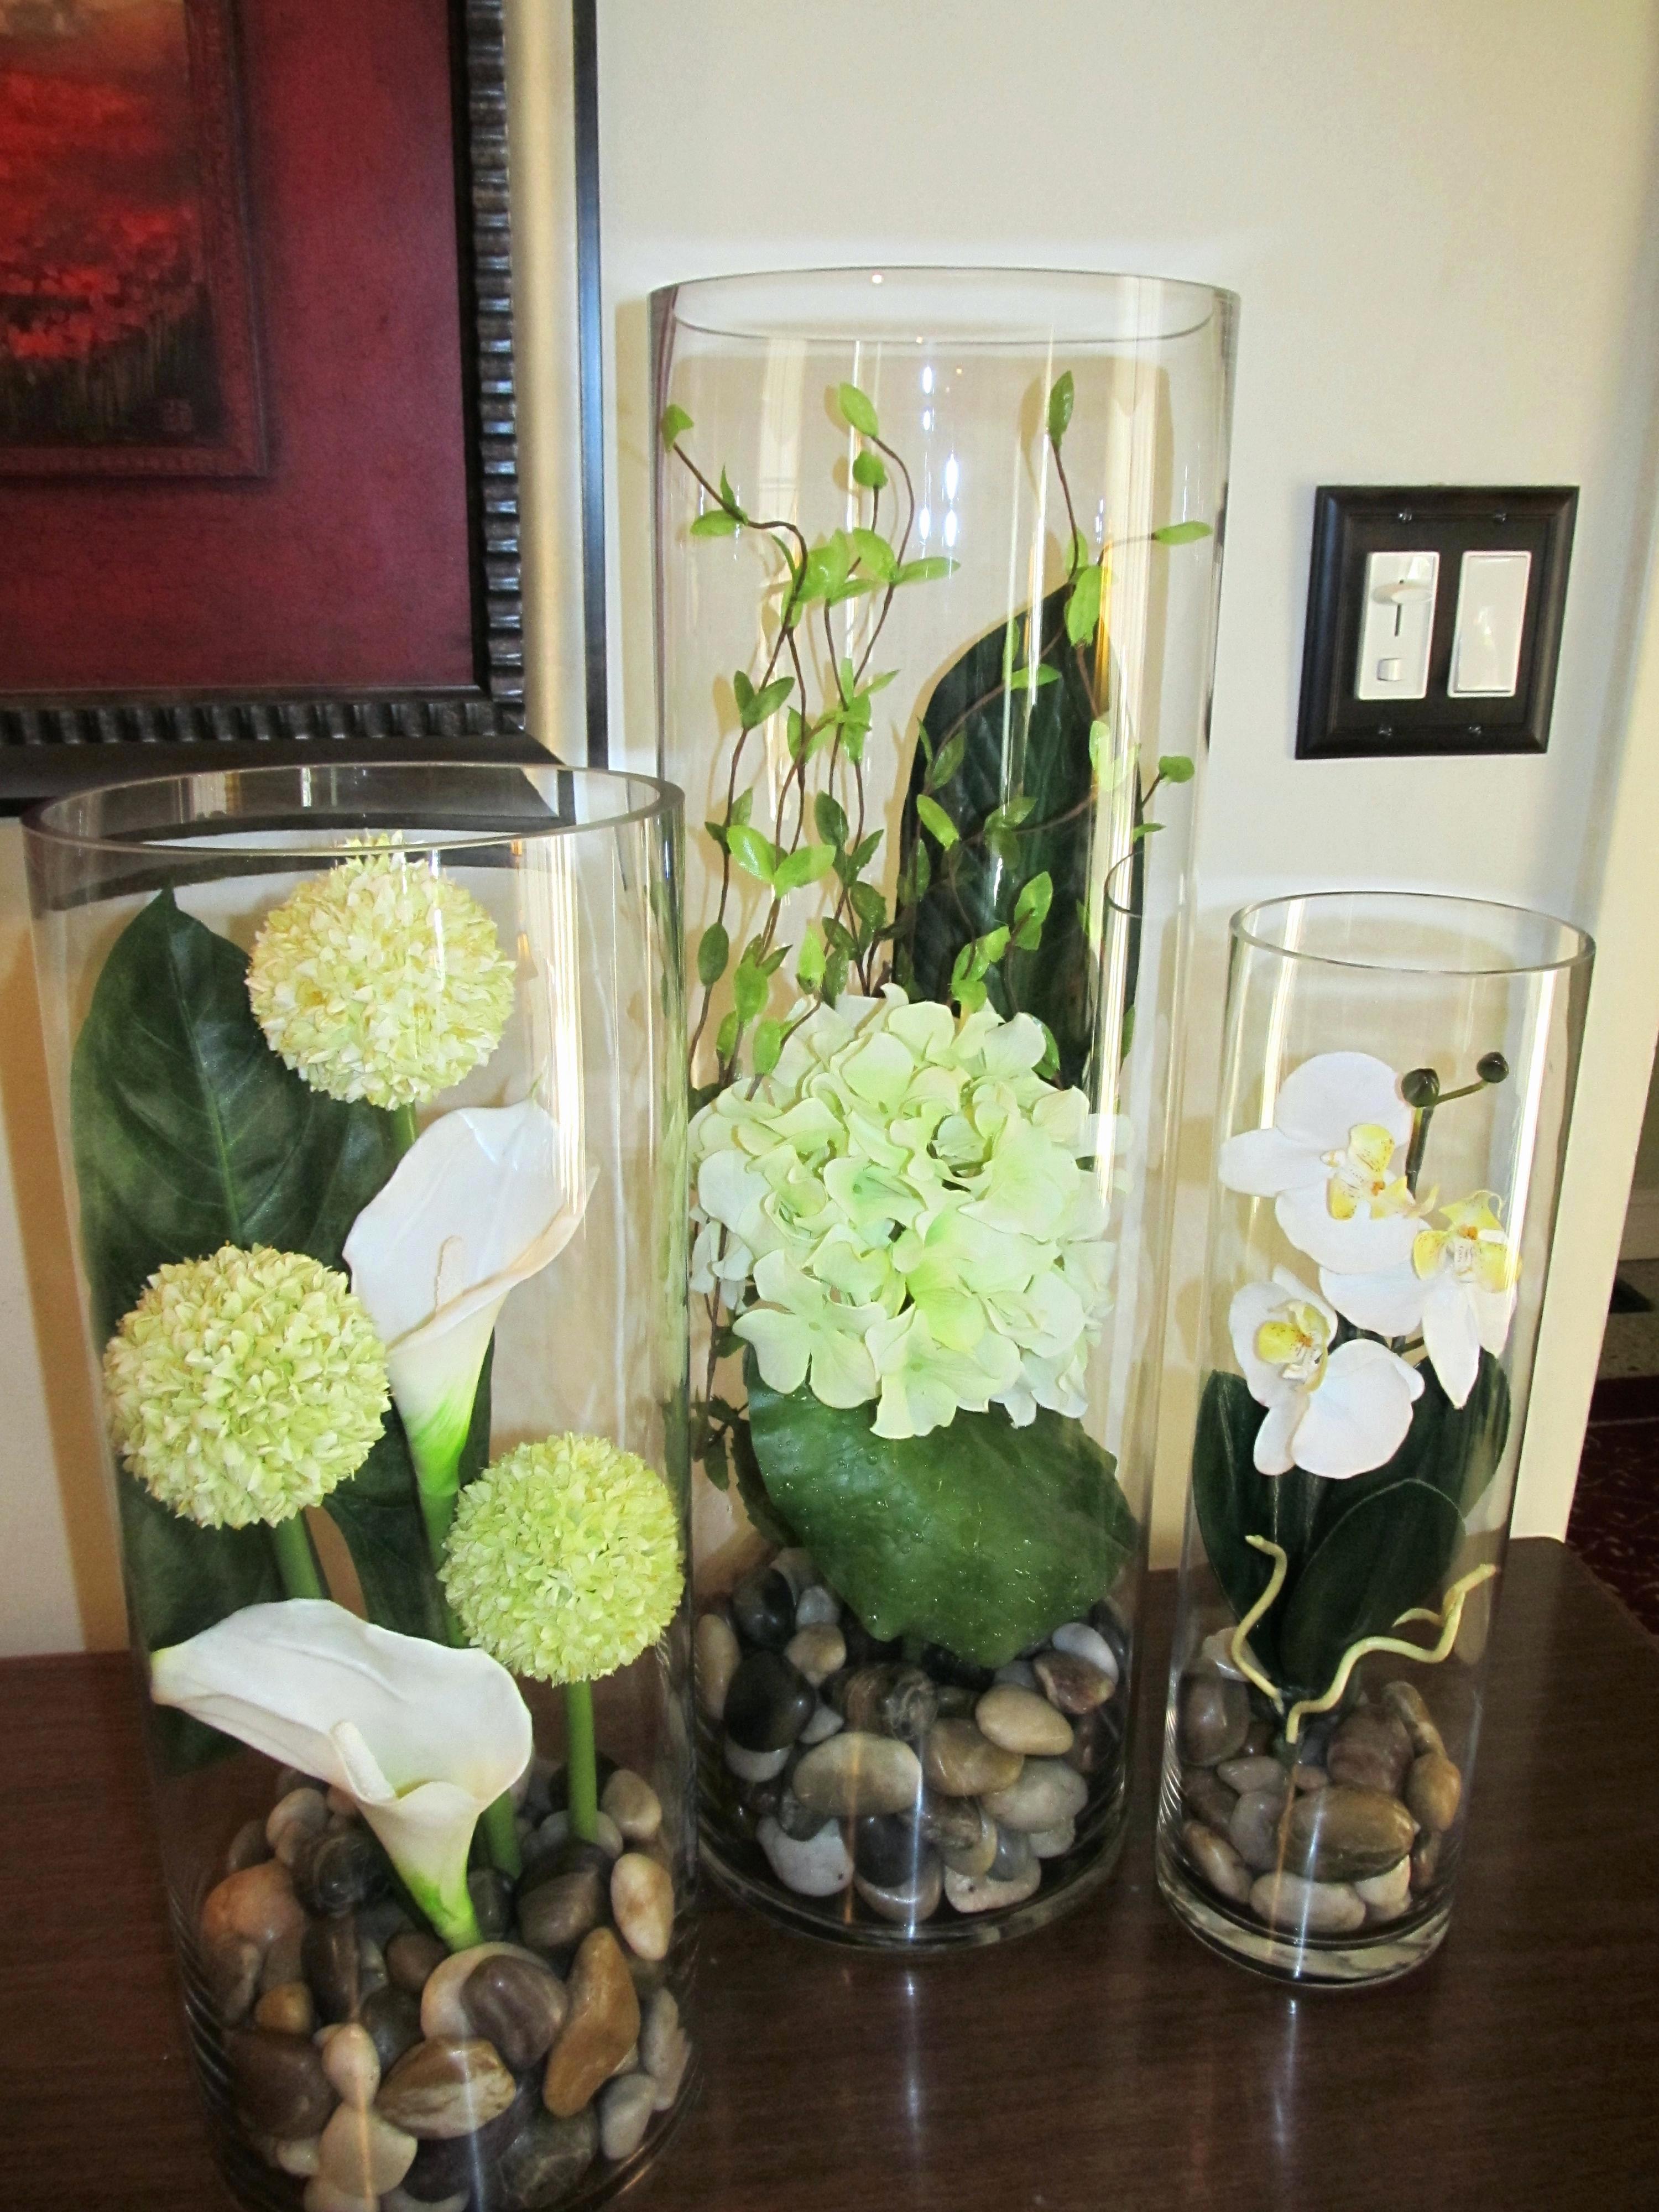 cut glass vases wholesale of 10 beautiful cylinder glass vases in bulk bogekompresorturkiye com within round glass vases for centerpieces uk round designs